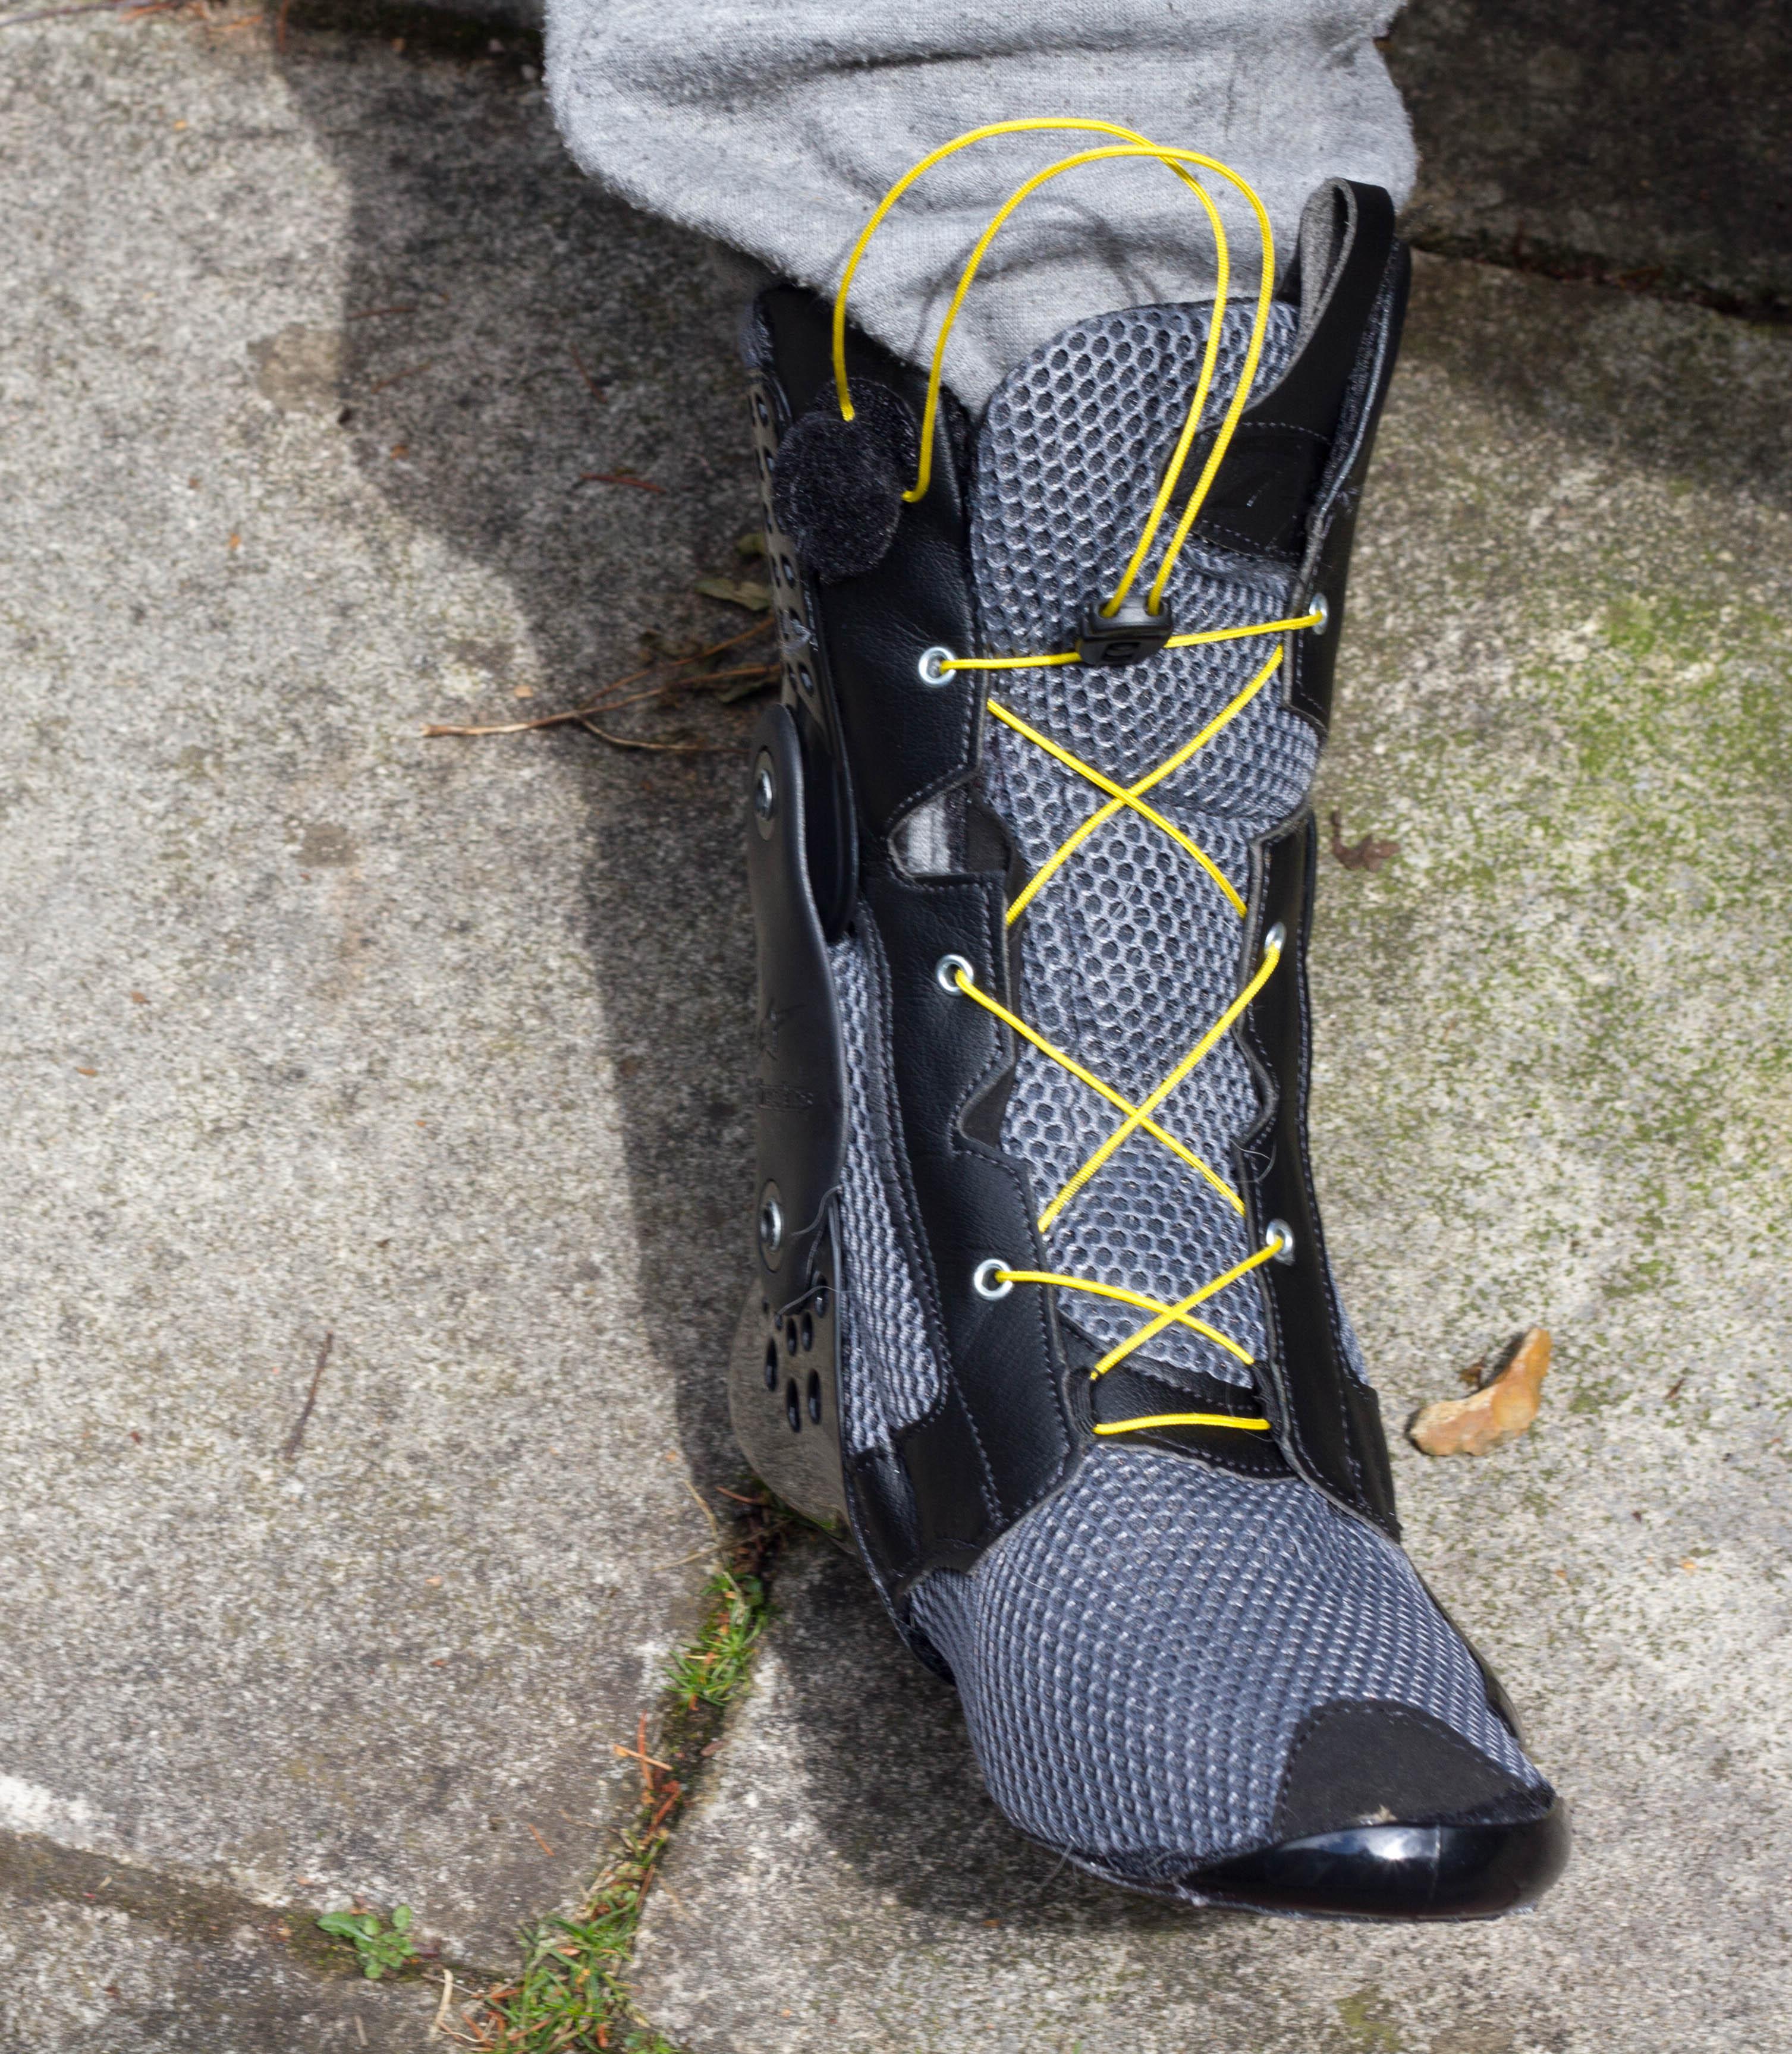 Supertech R boot review